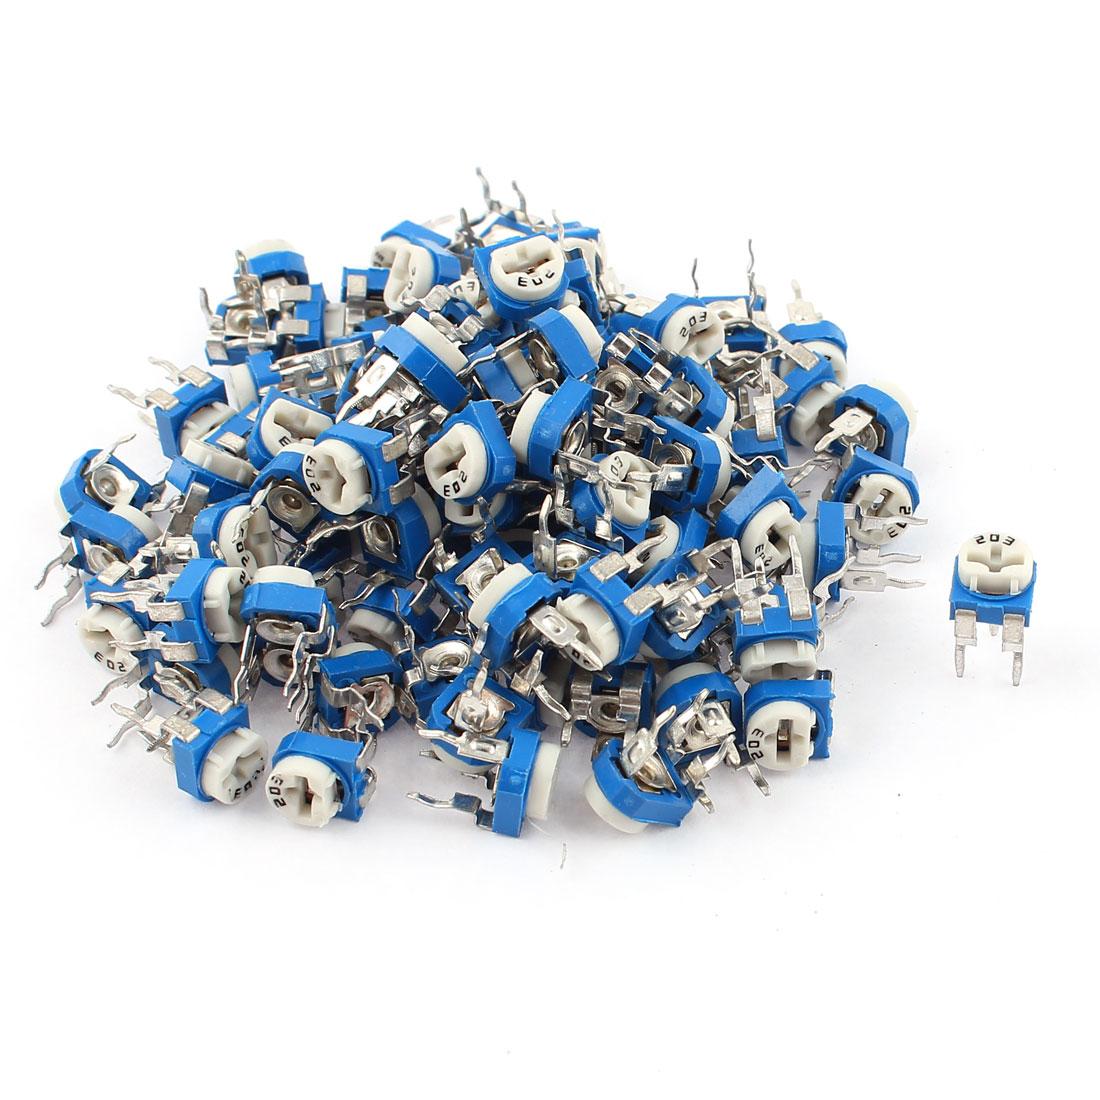 100Pcs 20K ohm Vertical PCB Preset Variable Resistor Trimmer Potentiometer Blue